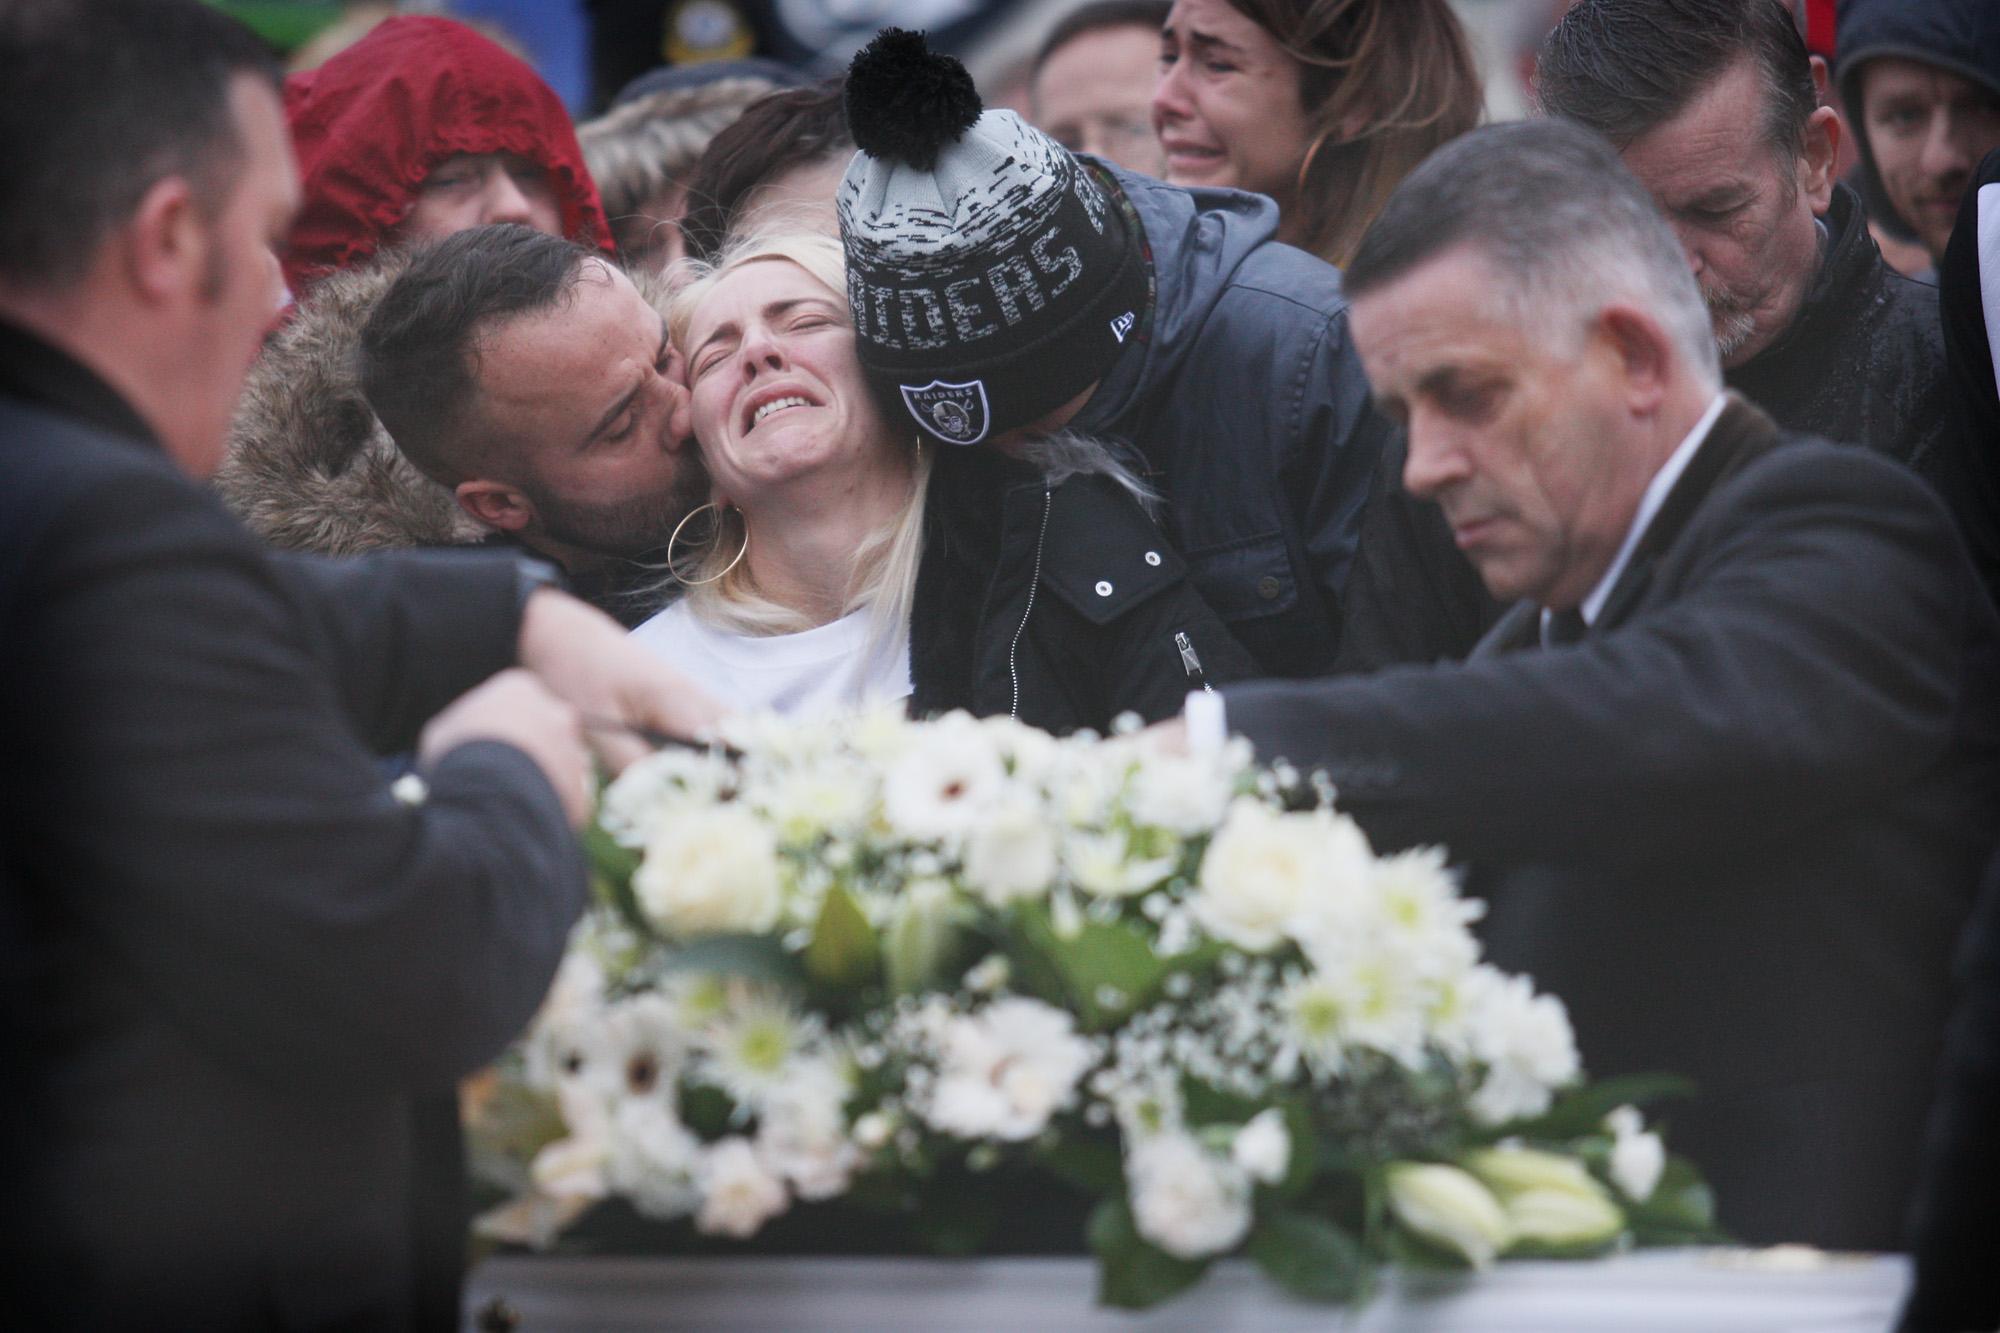 Eoin hamill funeral 0701tm19 02